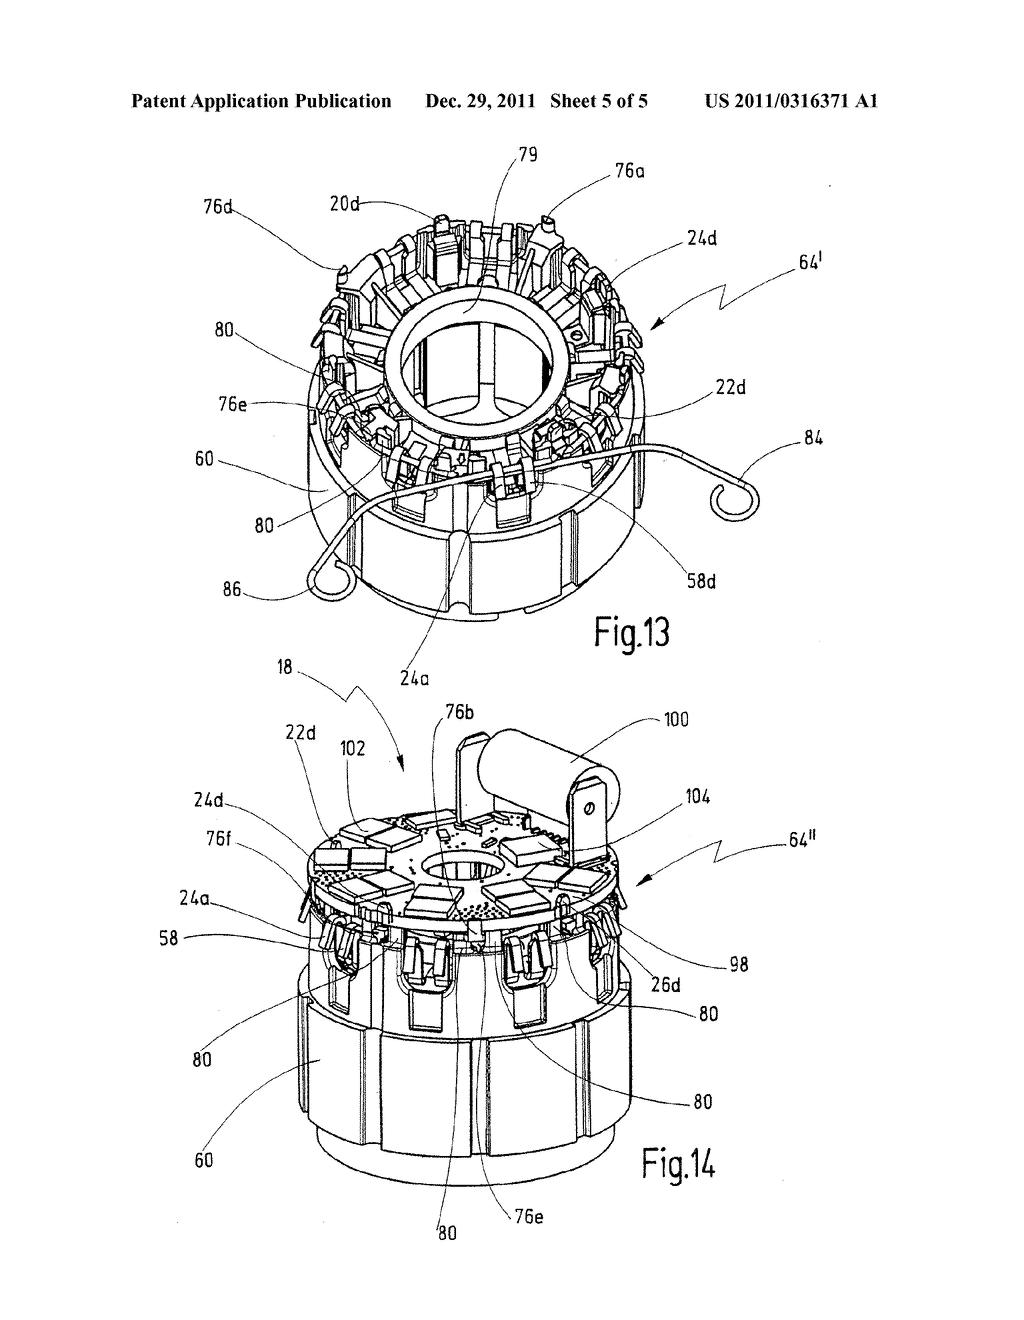 wiring diagram besides 220 volt single phase motor wiring diagram